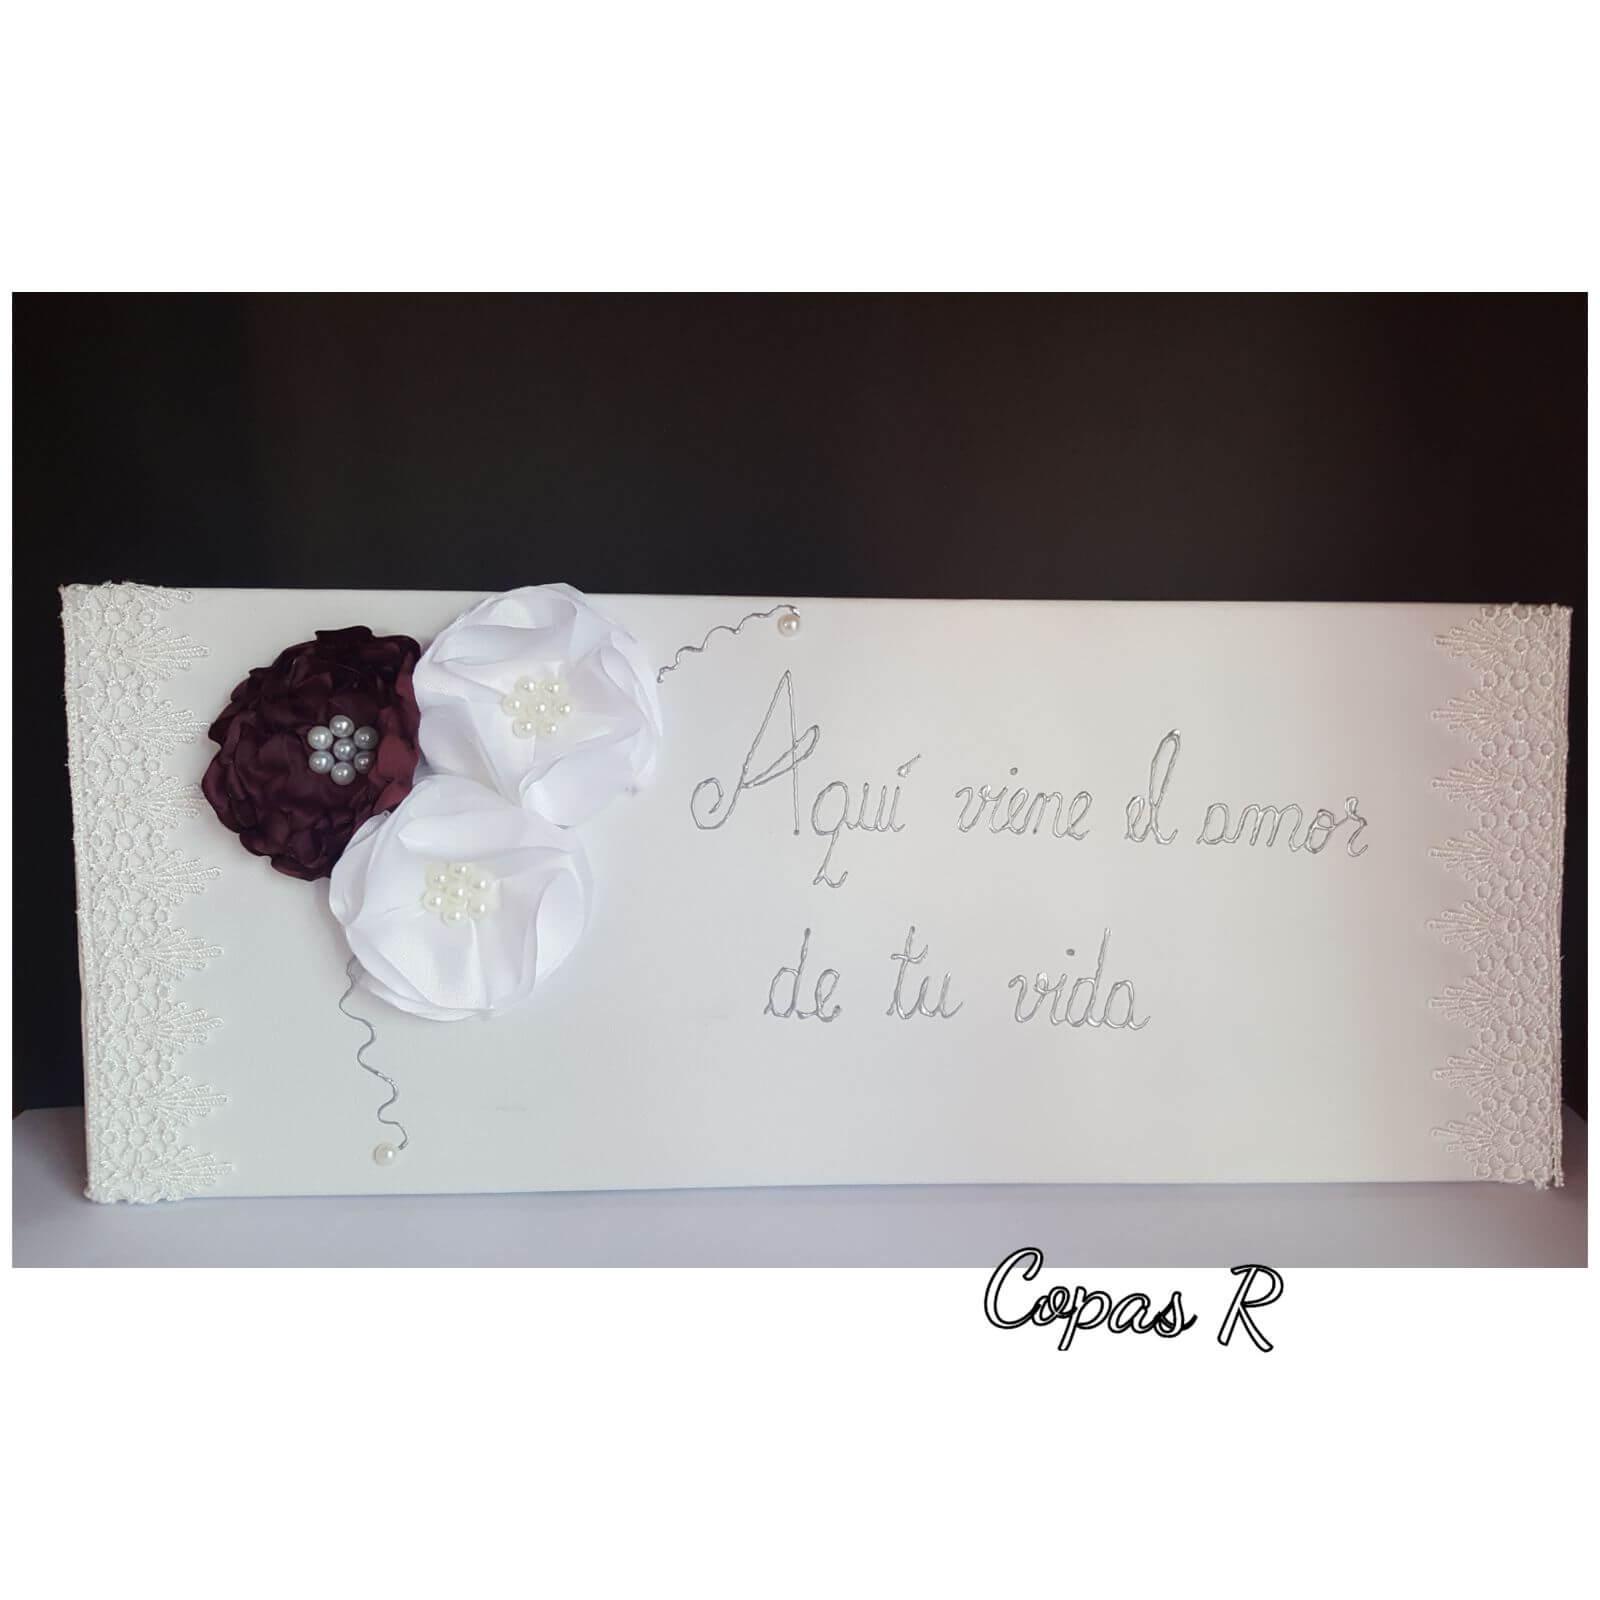 carteles boda carteles boda - carteles boda 6 - Carteles boda